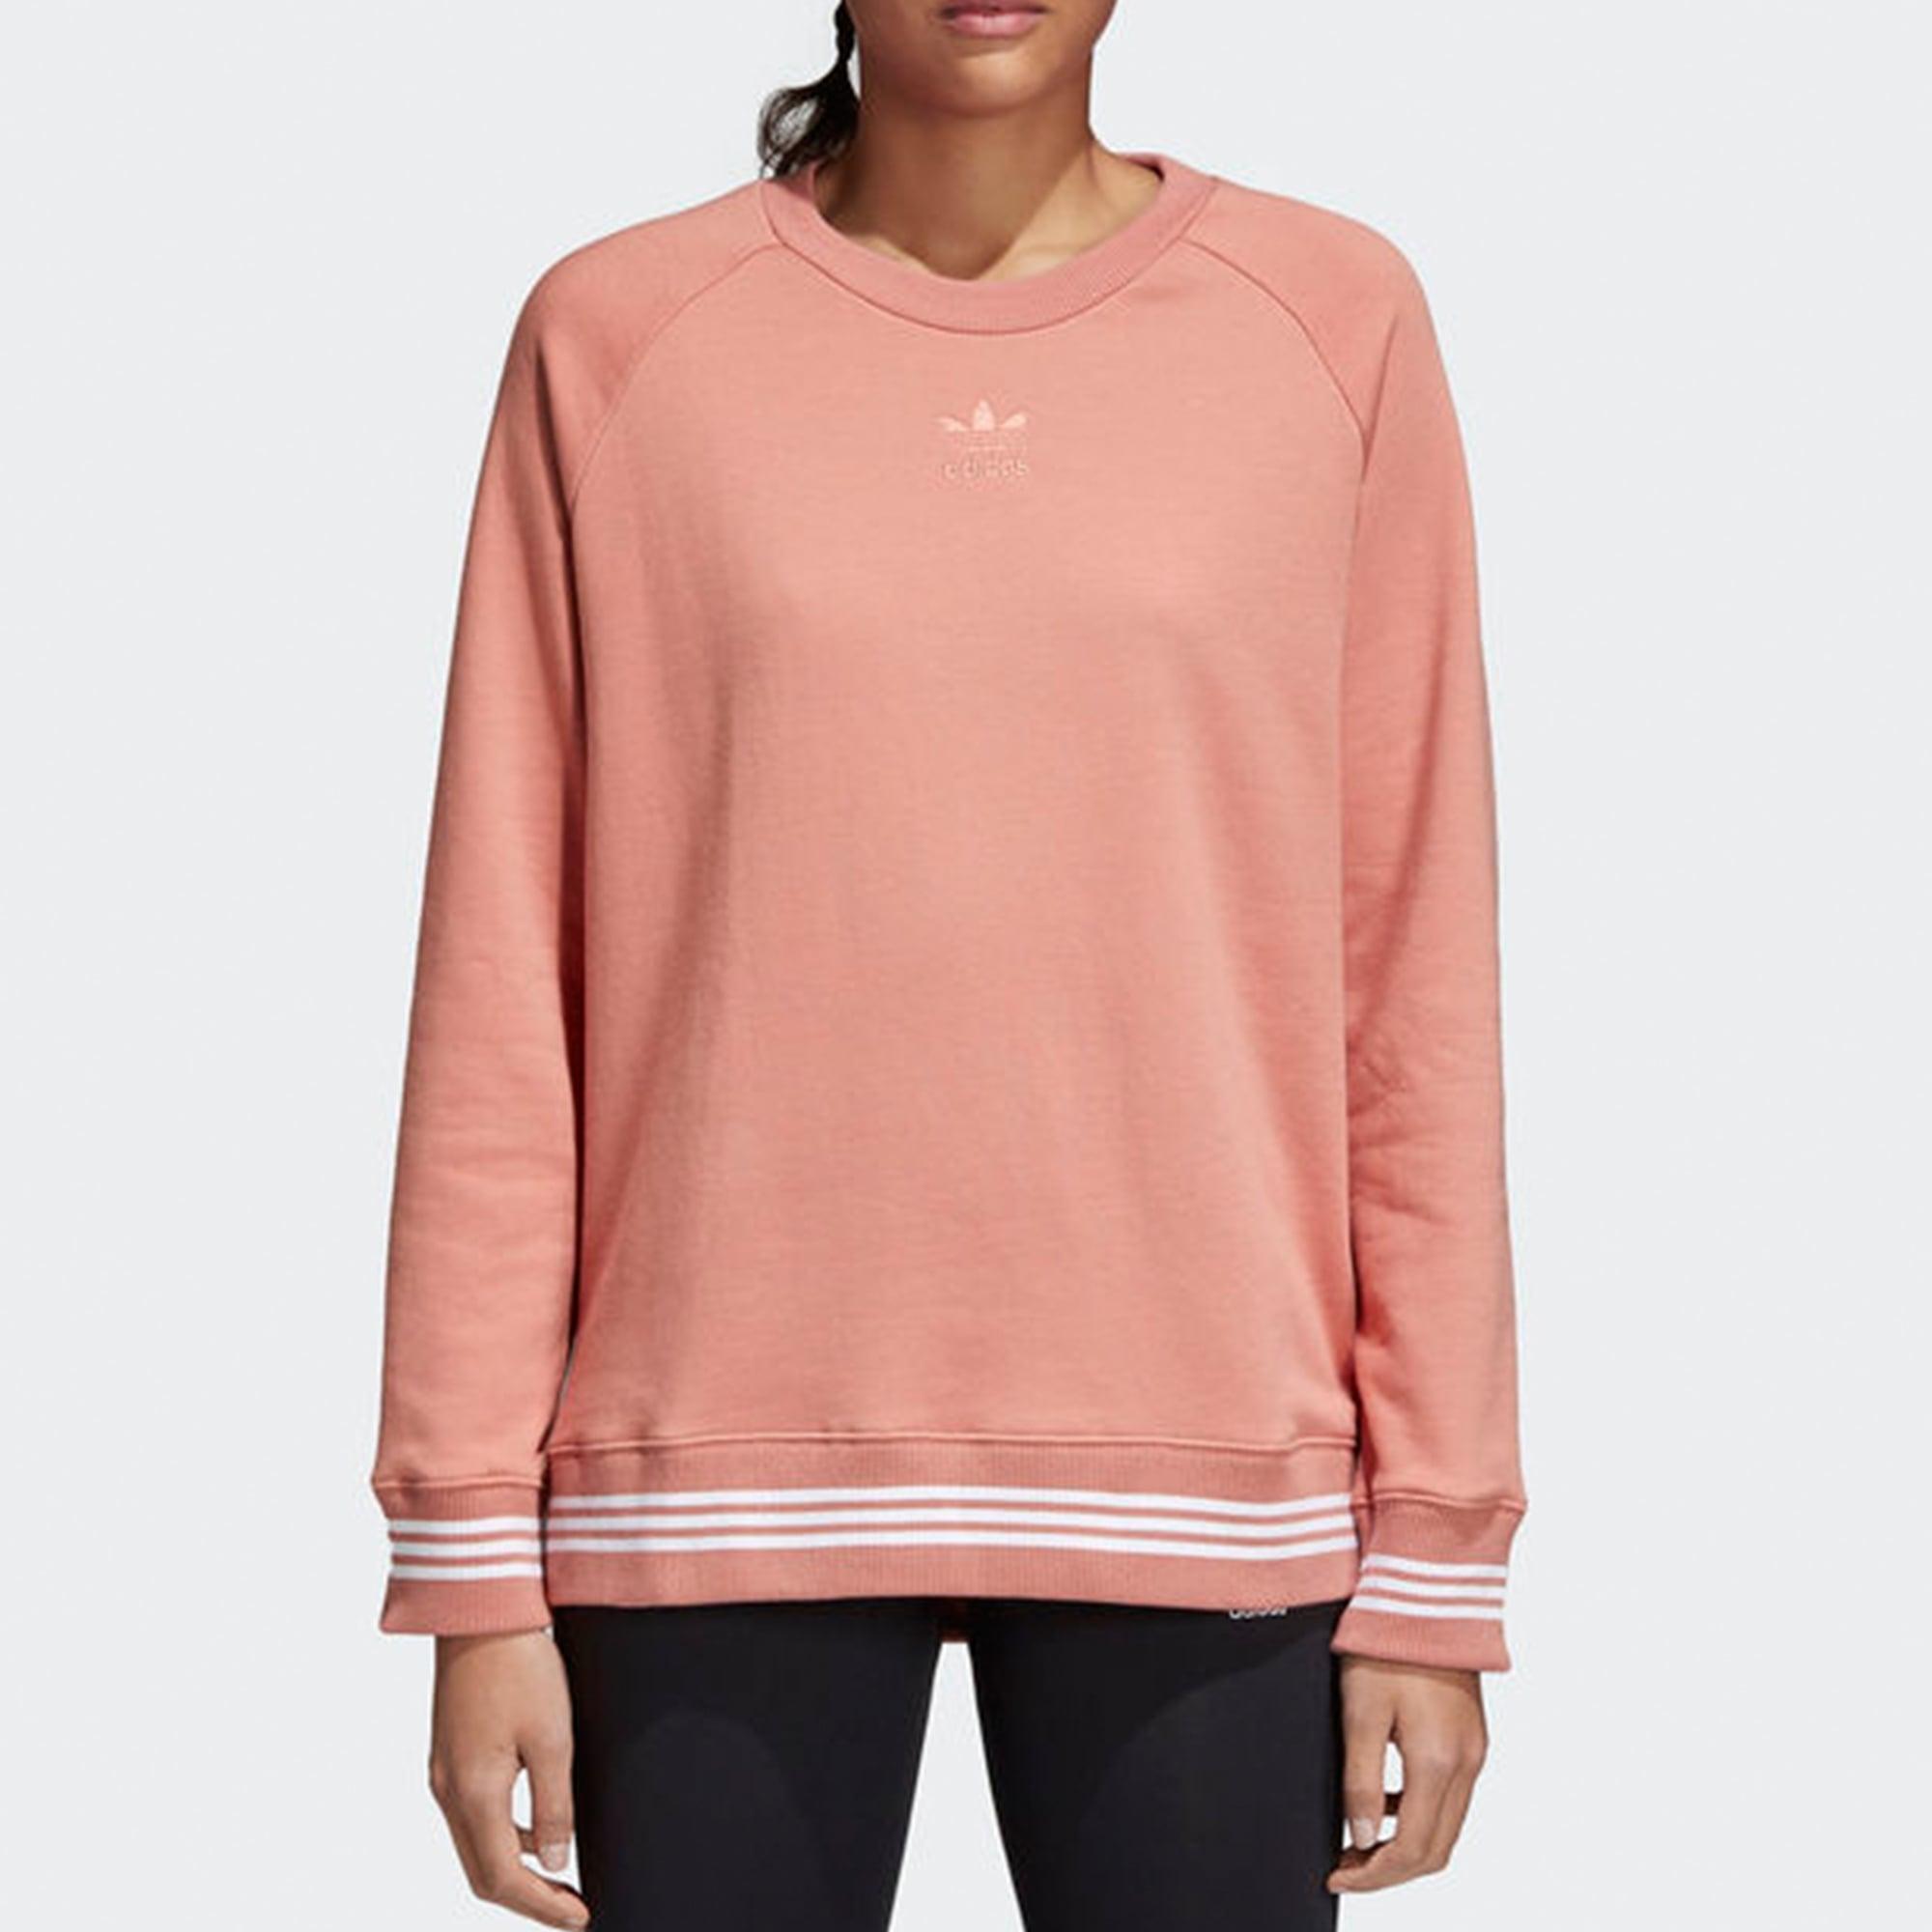 b28ed985945491 Adidas Originals Pink Womens Sweatshirt | Stuarts London | CD6903